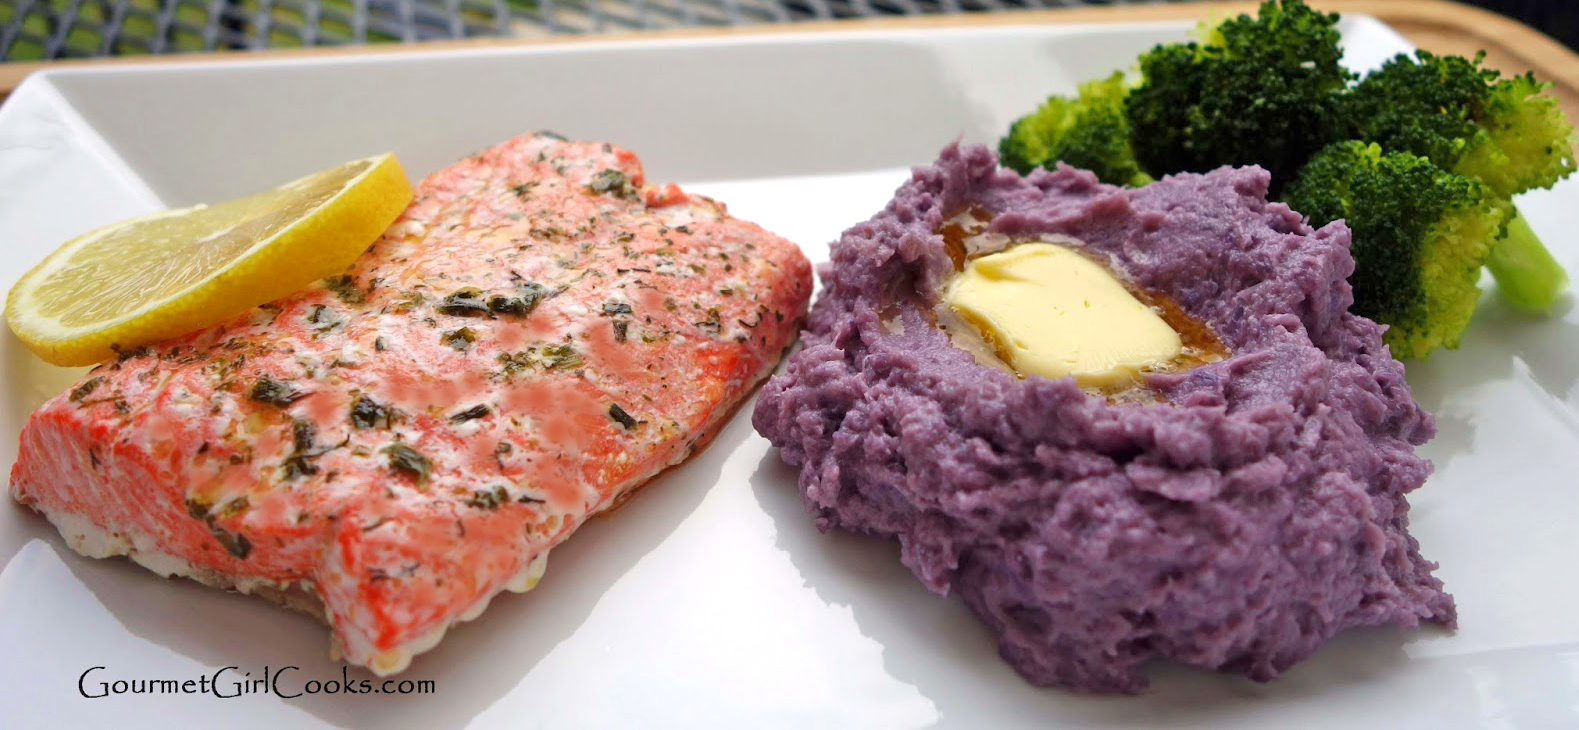 Gourmet Girl Cooks: Roasted Salmon w/ Purple Cauliflower Mash